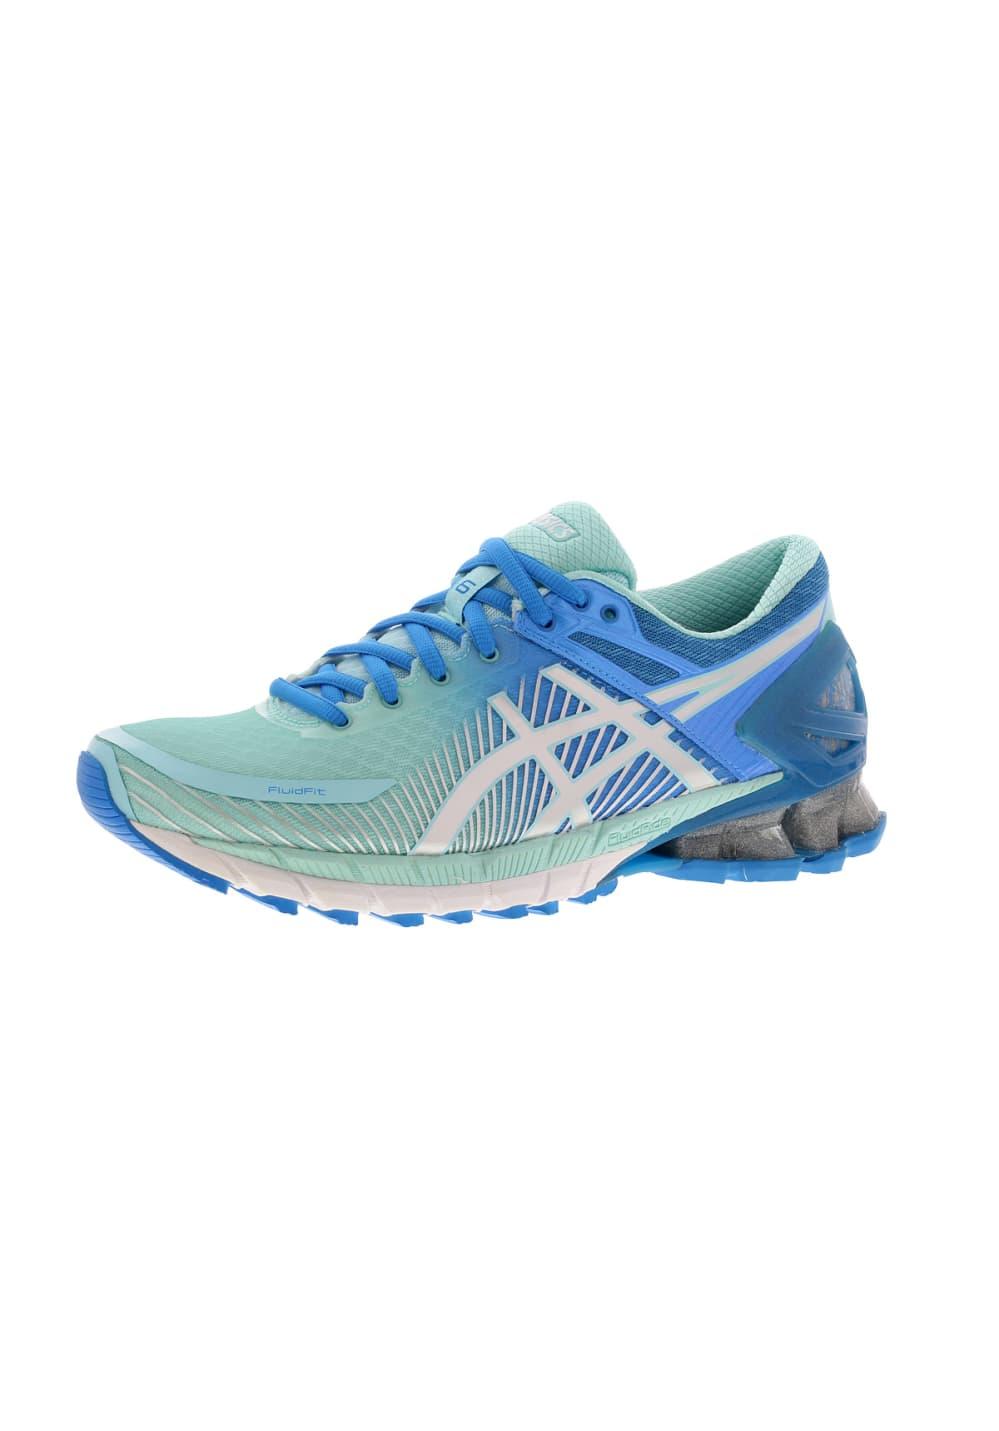 super popular 364b4 279f9 ASICS GEL-Kinsei 6 - Running shoes for Women - Blue